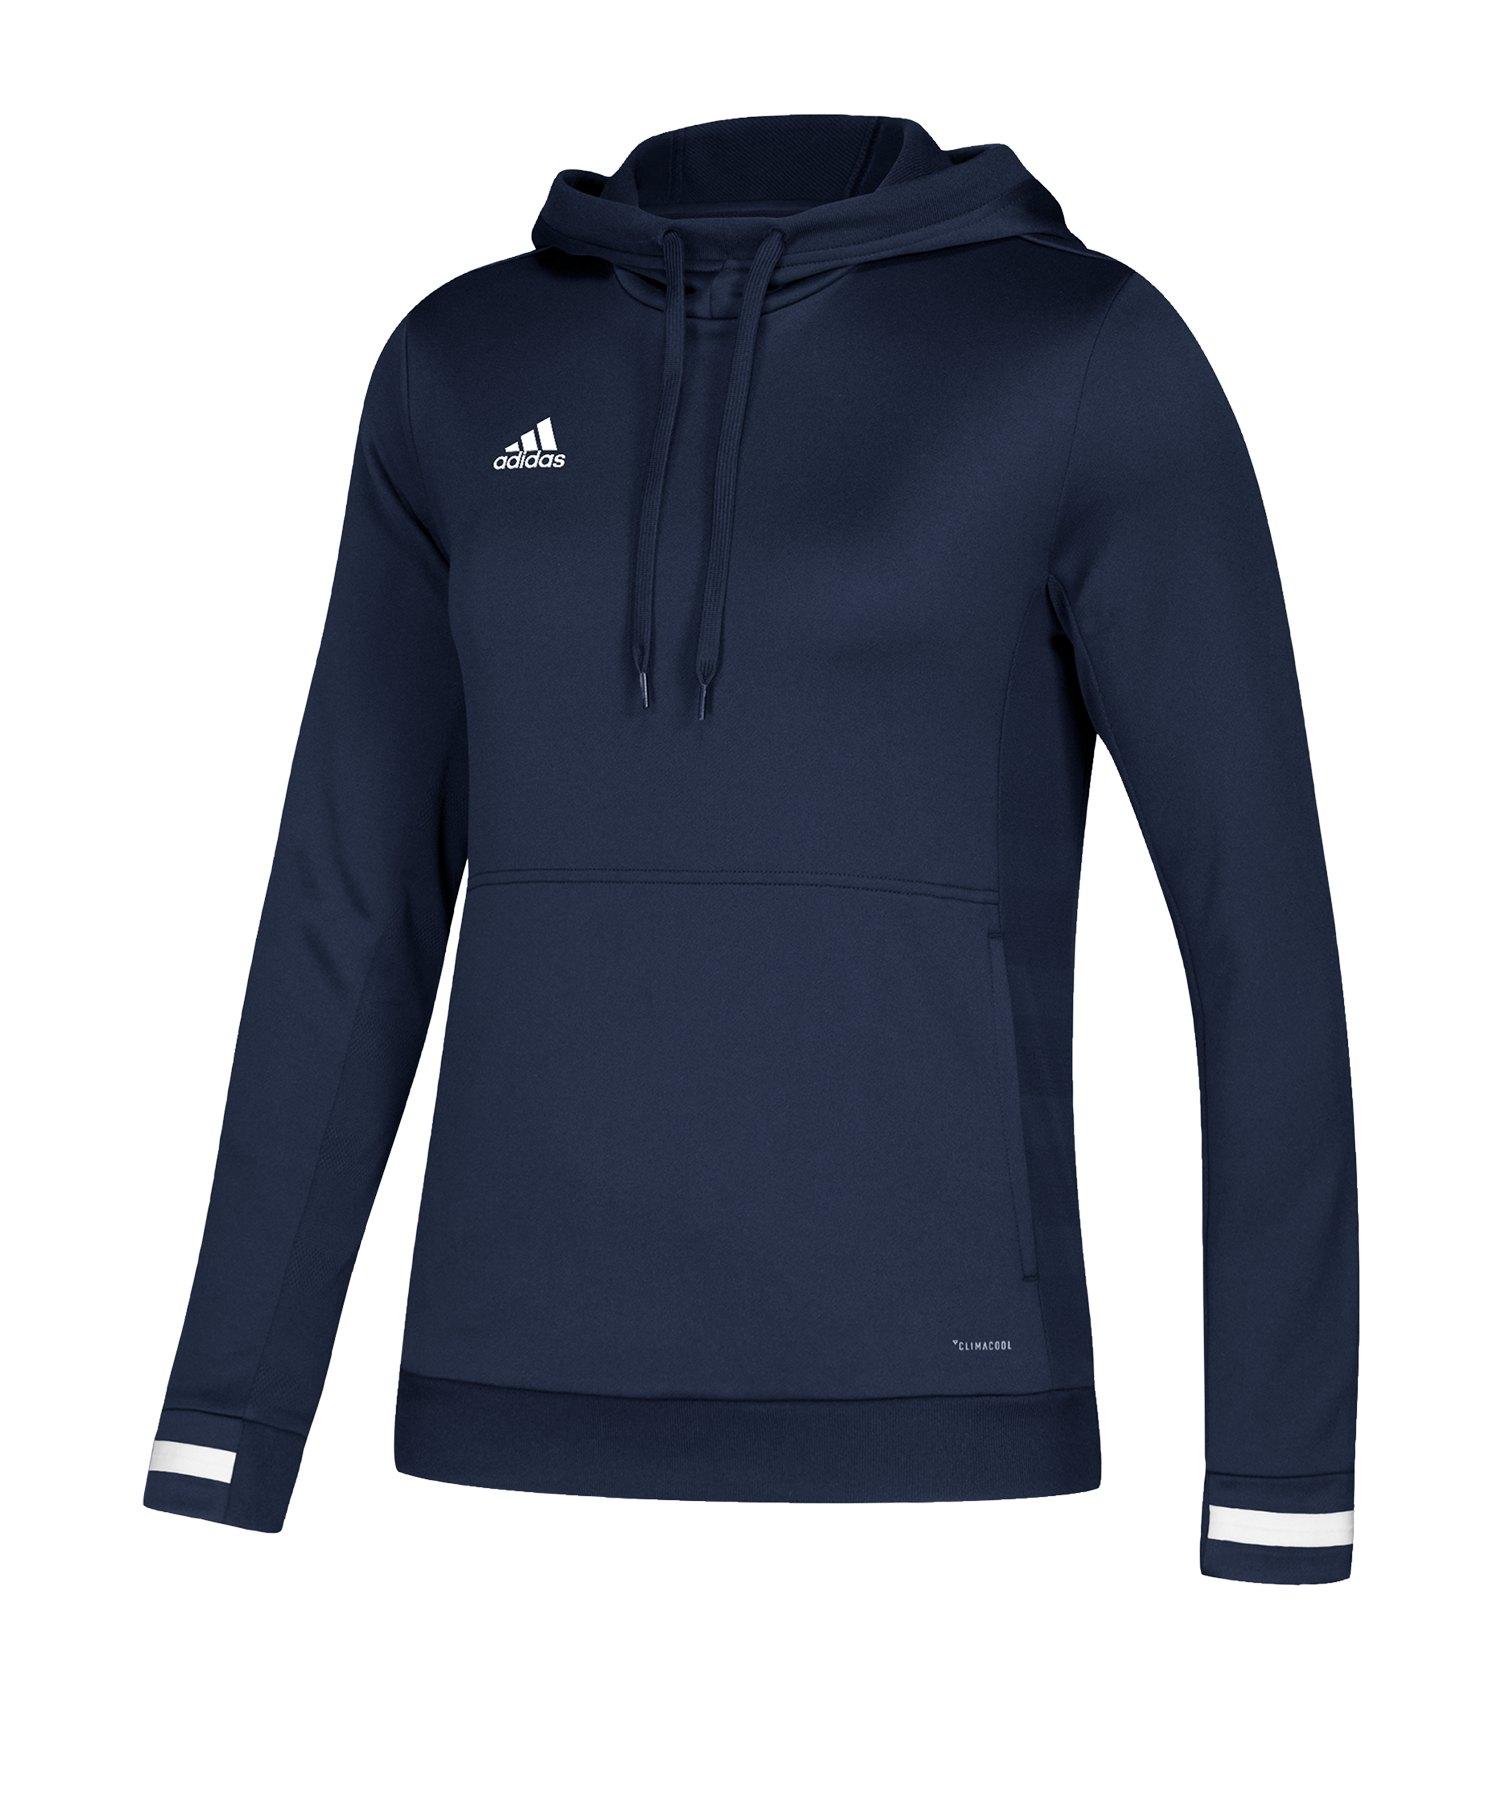 adidas Team 19 Kapuzensweatshirt Damen Blau - blau